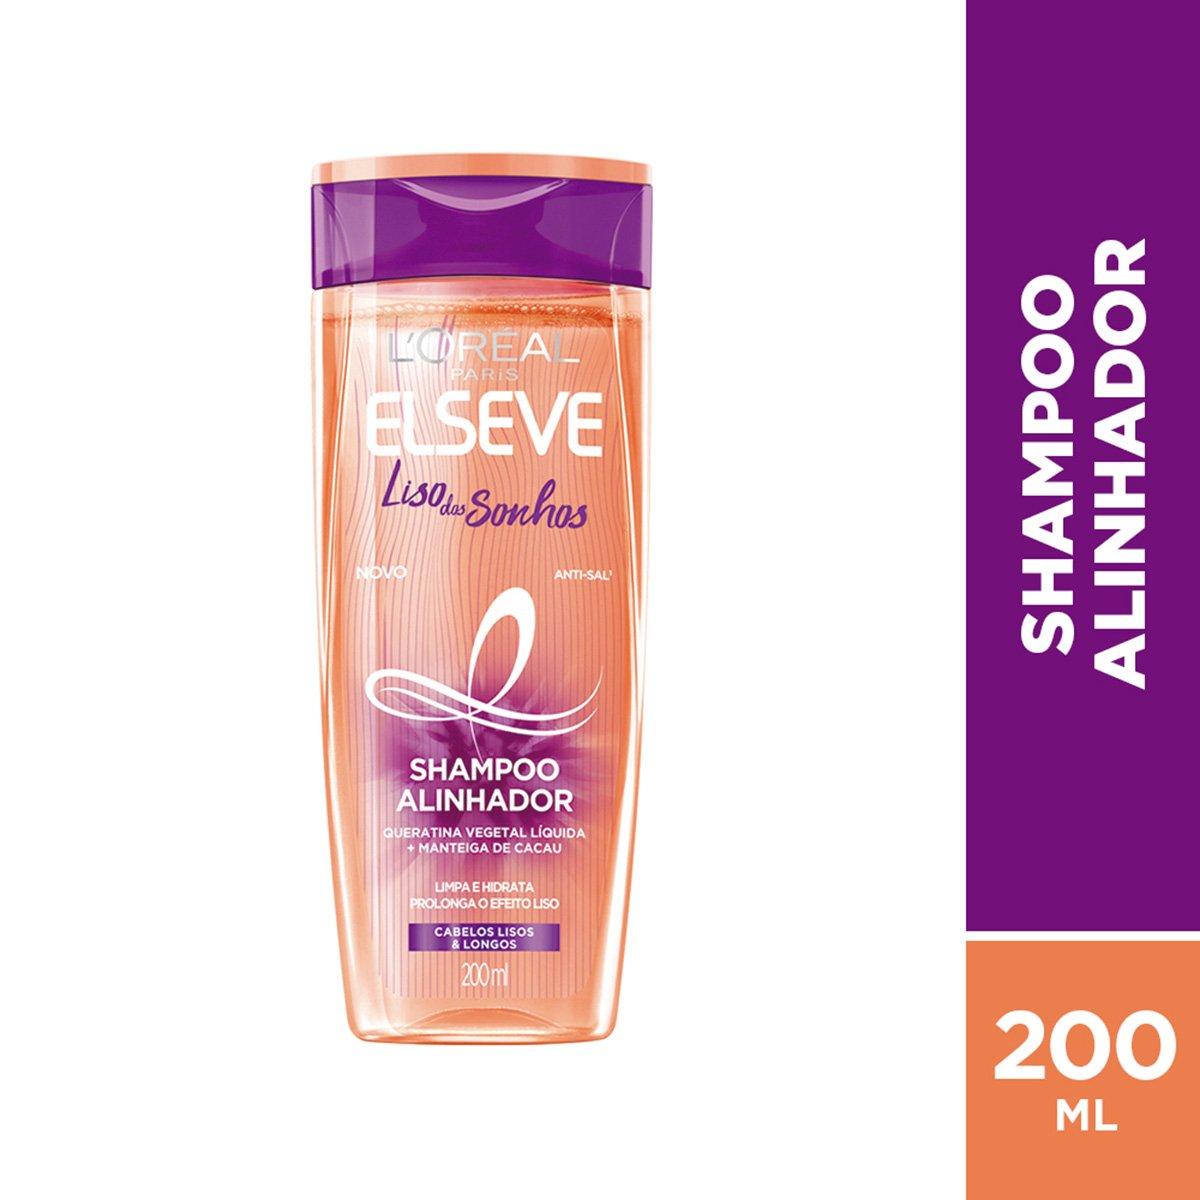 Shampoo Elseve Liso dos Sonhos 200ml